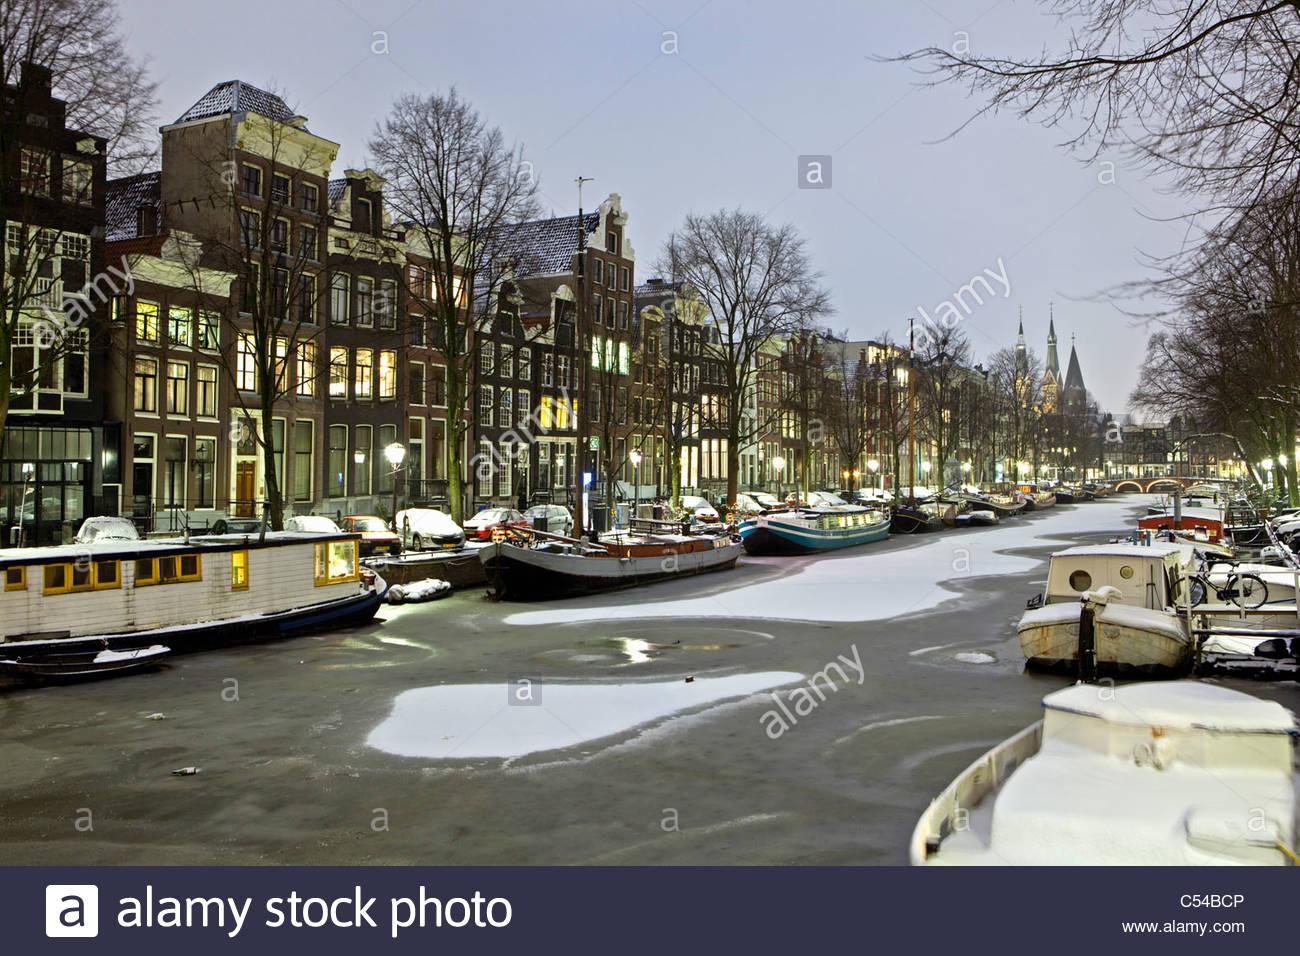 Niederlande, Amsterdam, Häuser 17. Jahrhundert am Kanal namens Keizersgracht. Winter, Schnee, Hausboote, Dämmerung. Stockbild